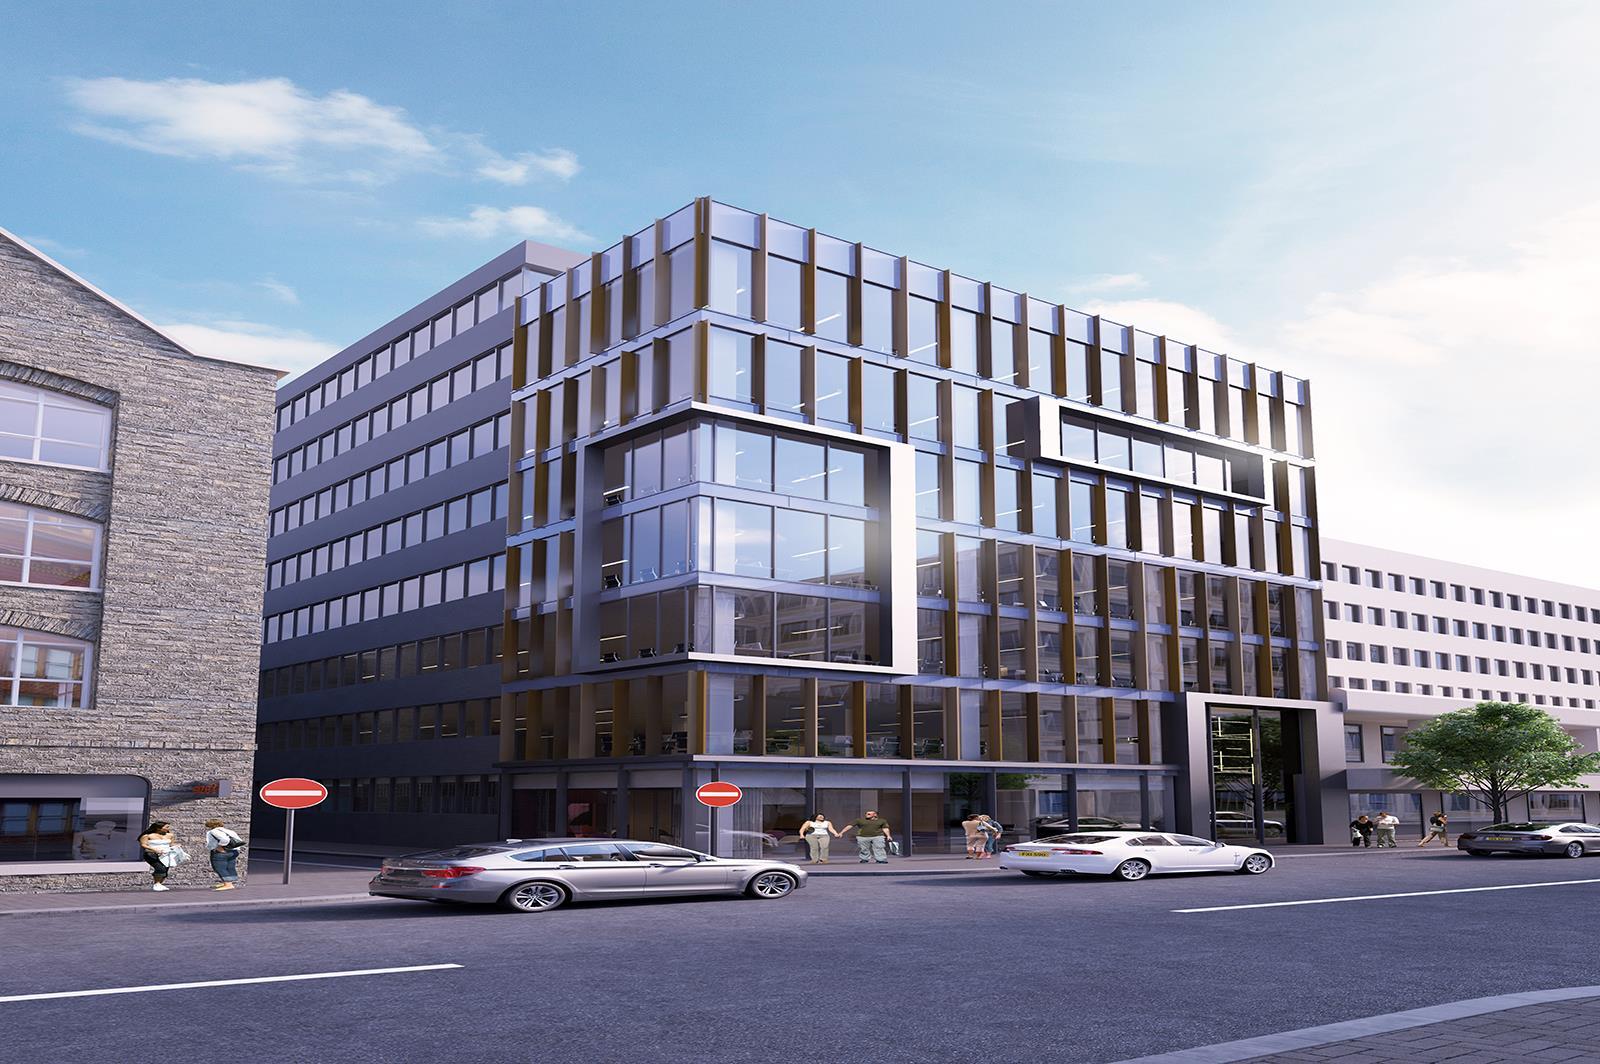 Urban HQ, Eagle Star House, 5-7 Upper Queen Street, Belfast, County Antrim, BT1